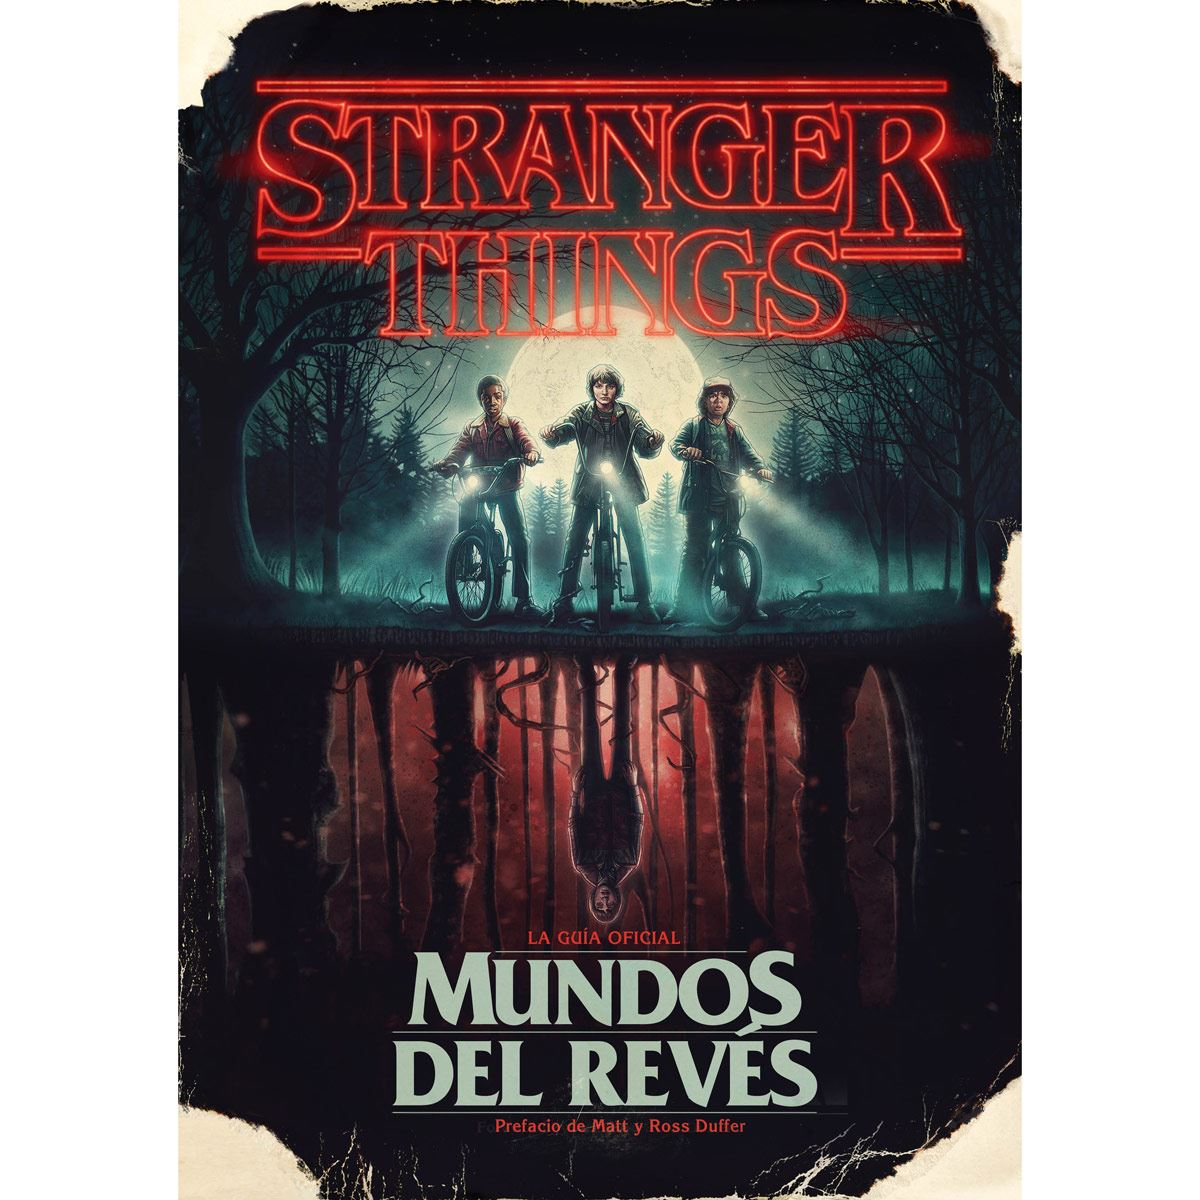 Stranger things. El mundo del reves